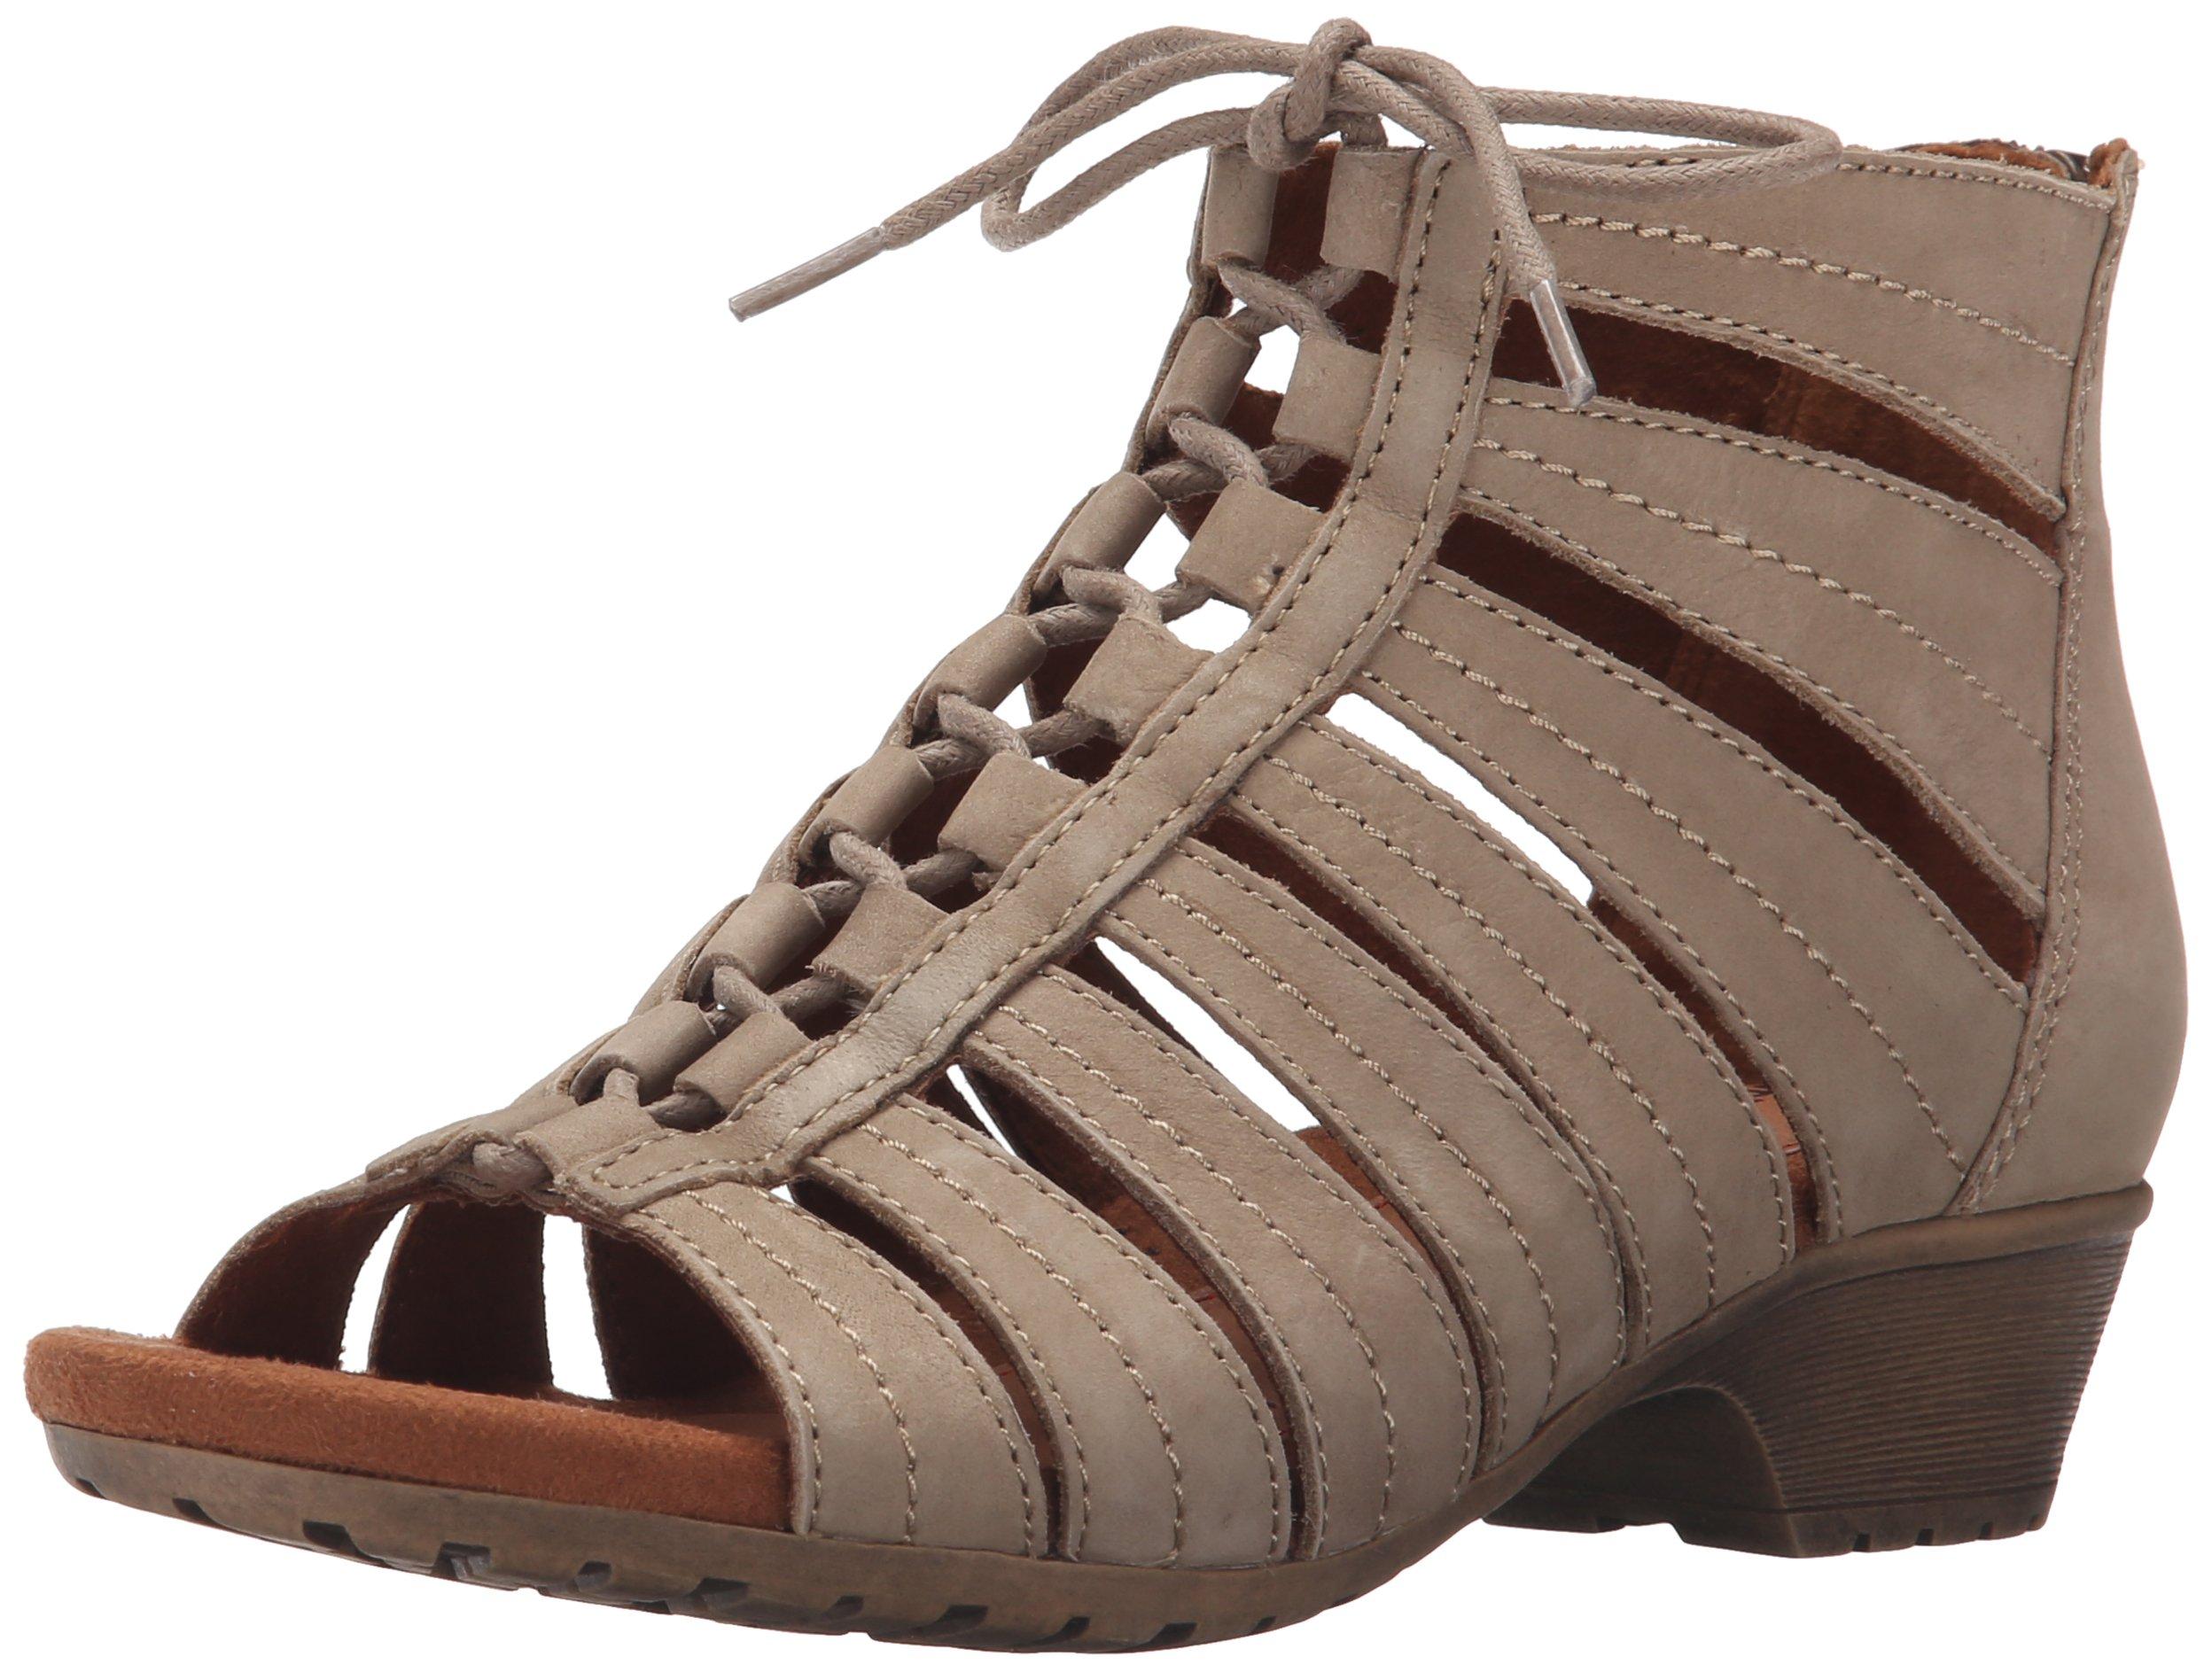 Cobb Hill Rockport Women's Gabby-CH Heeled Sandal, Khaki, 9 W US